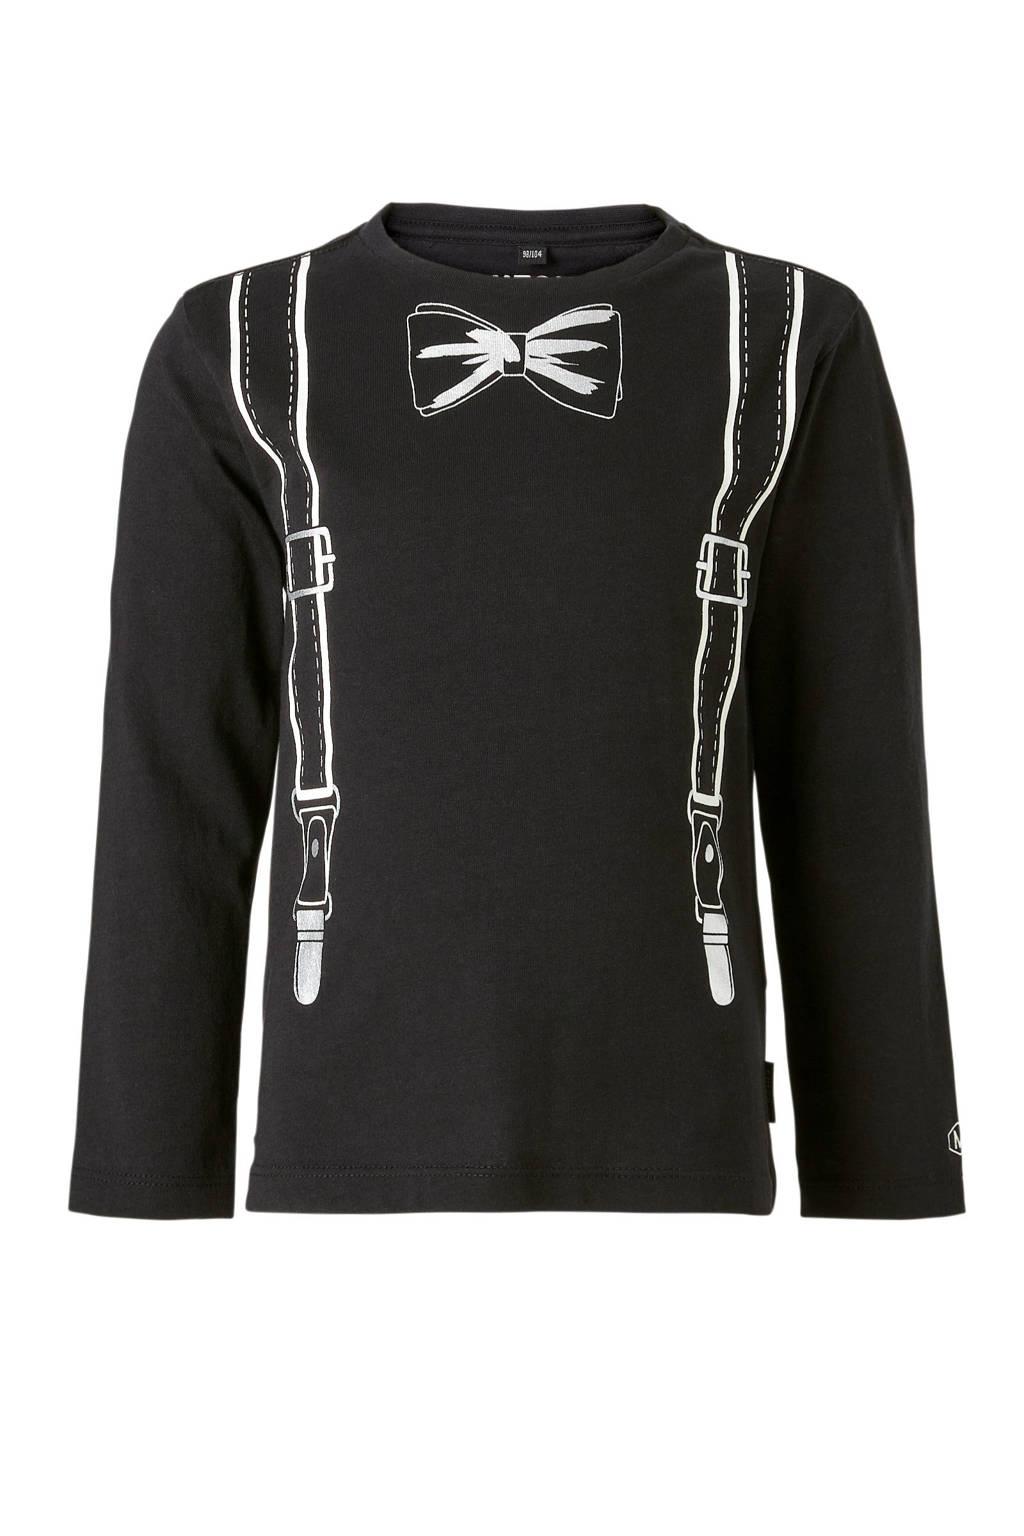 Mitch T-shirt Zipp met lange mouwen, Zwart